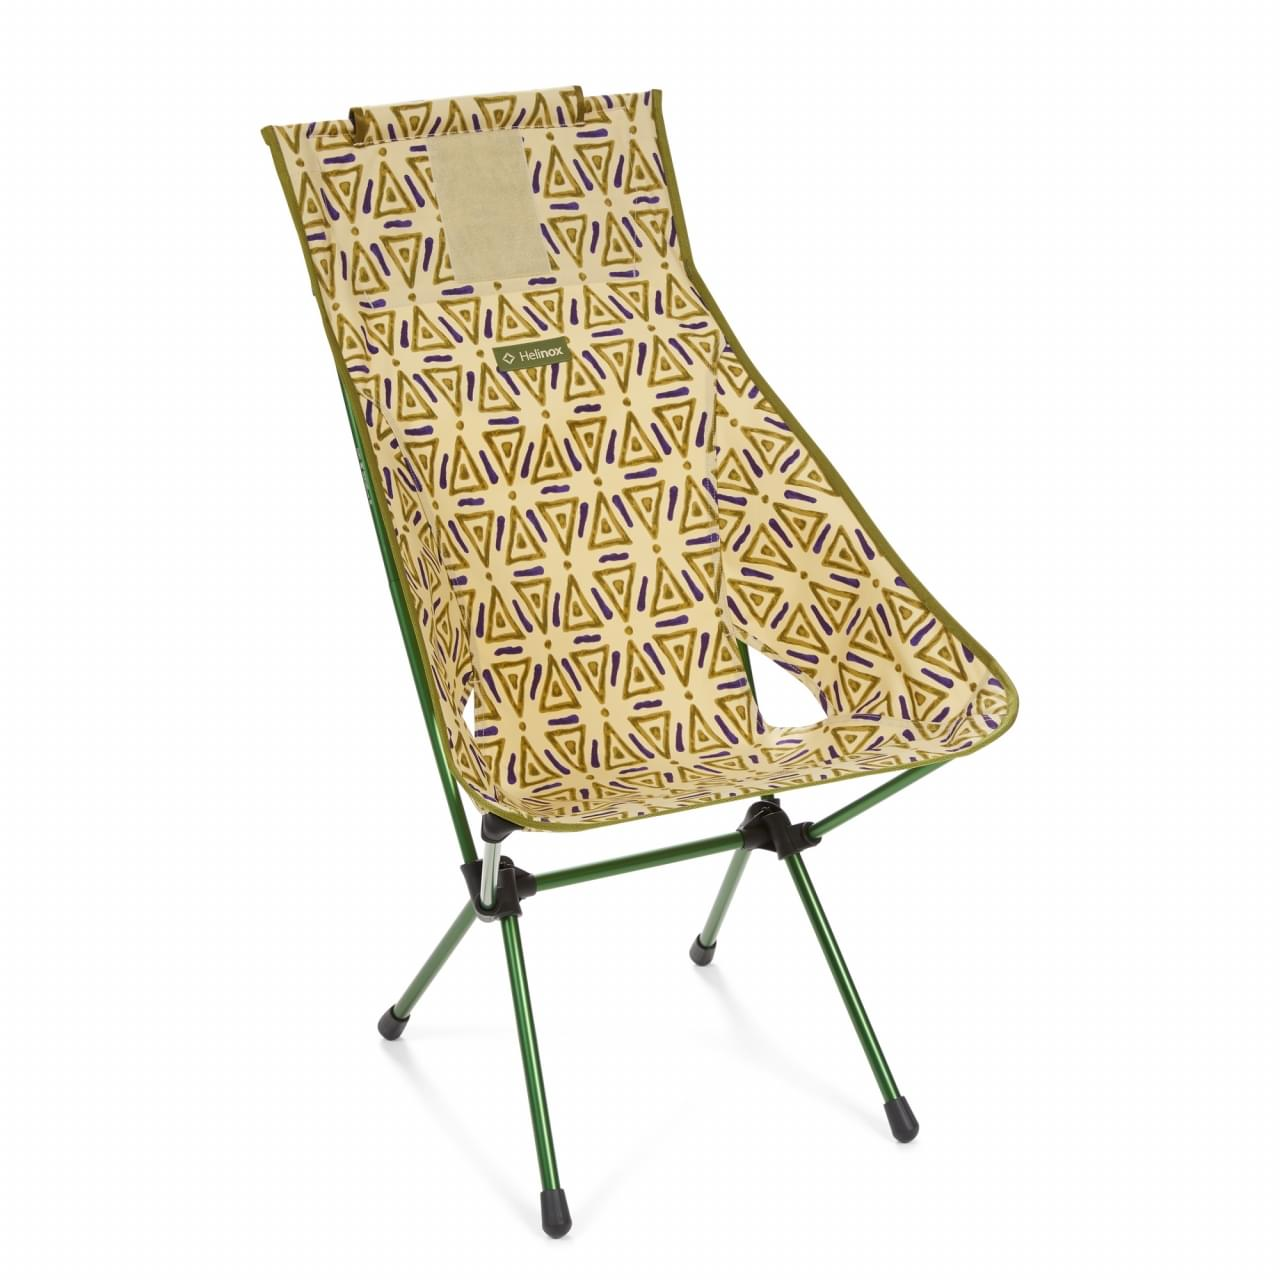 Helinox Sunset Chair Triangle Lichtgewicht Stoel - Groen